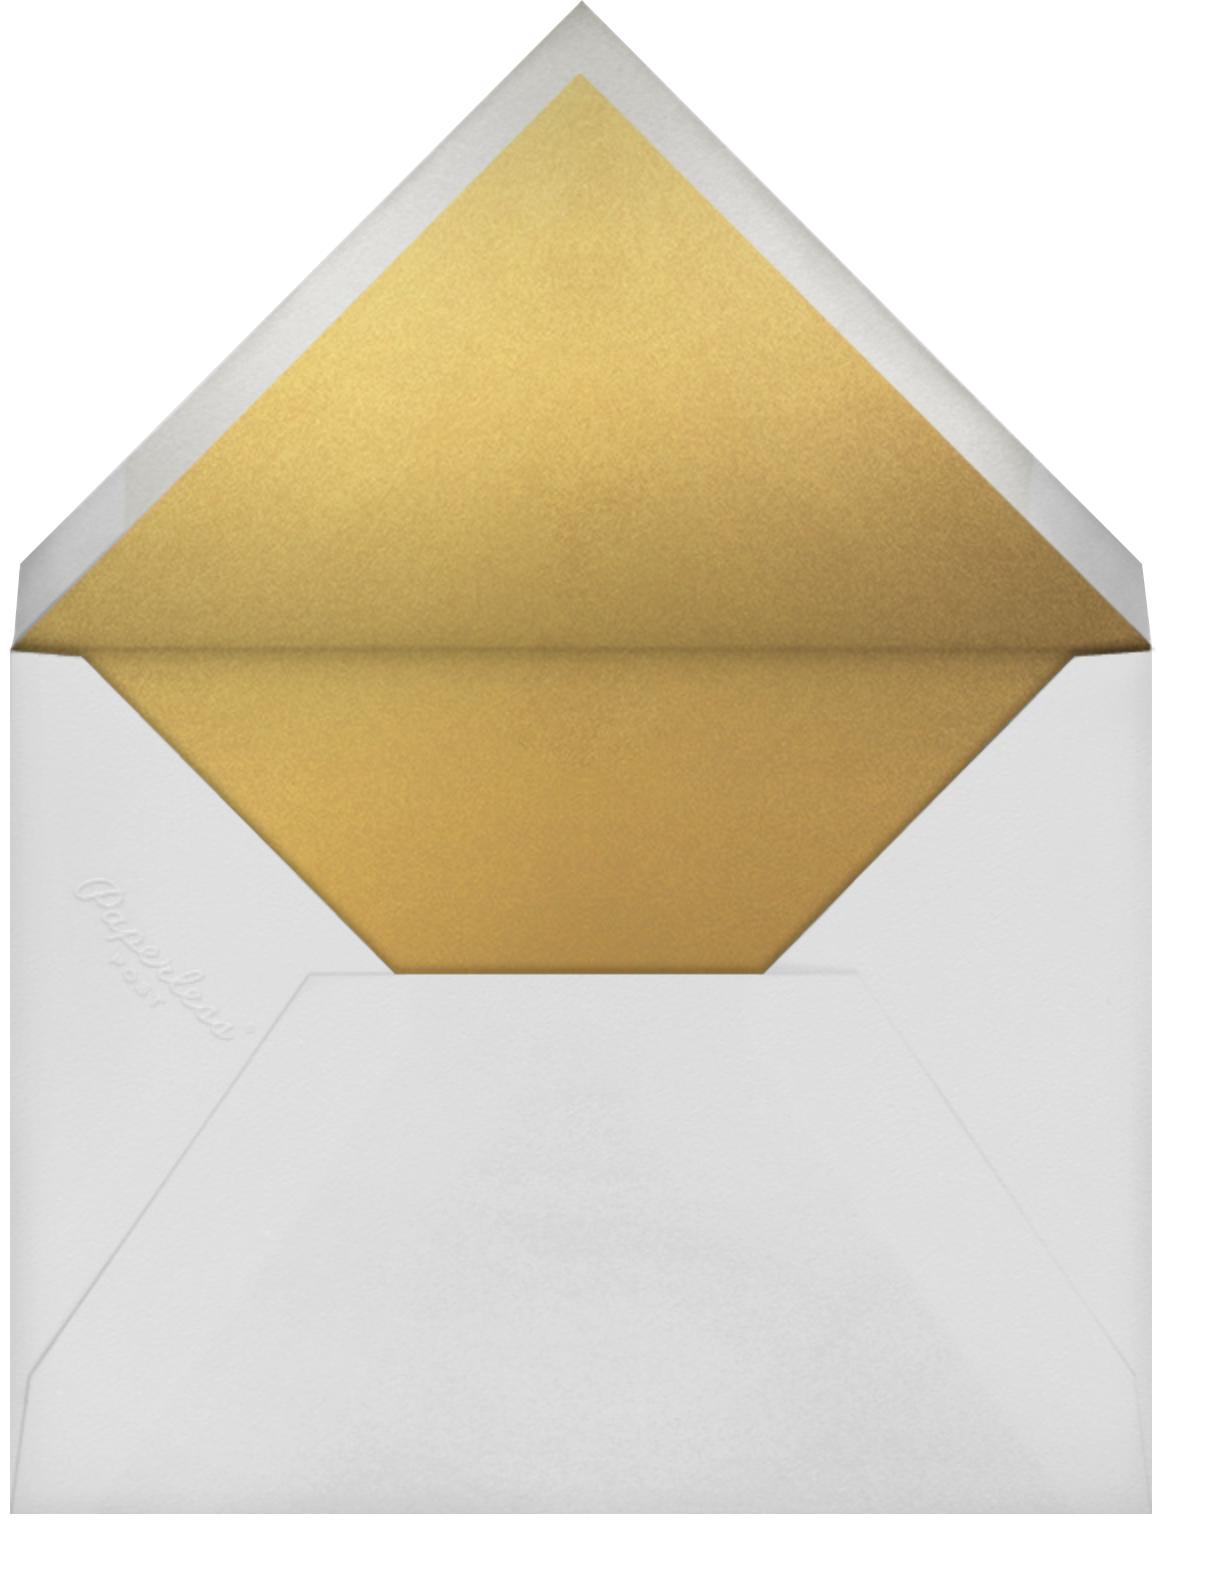 Thirlmere (Invitation) - Paperless Post - Virtual wedding invitations - envelope back